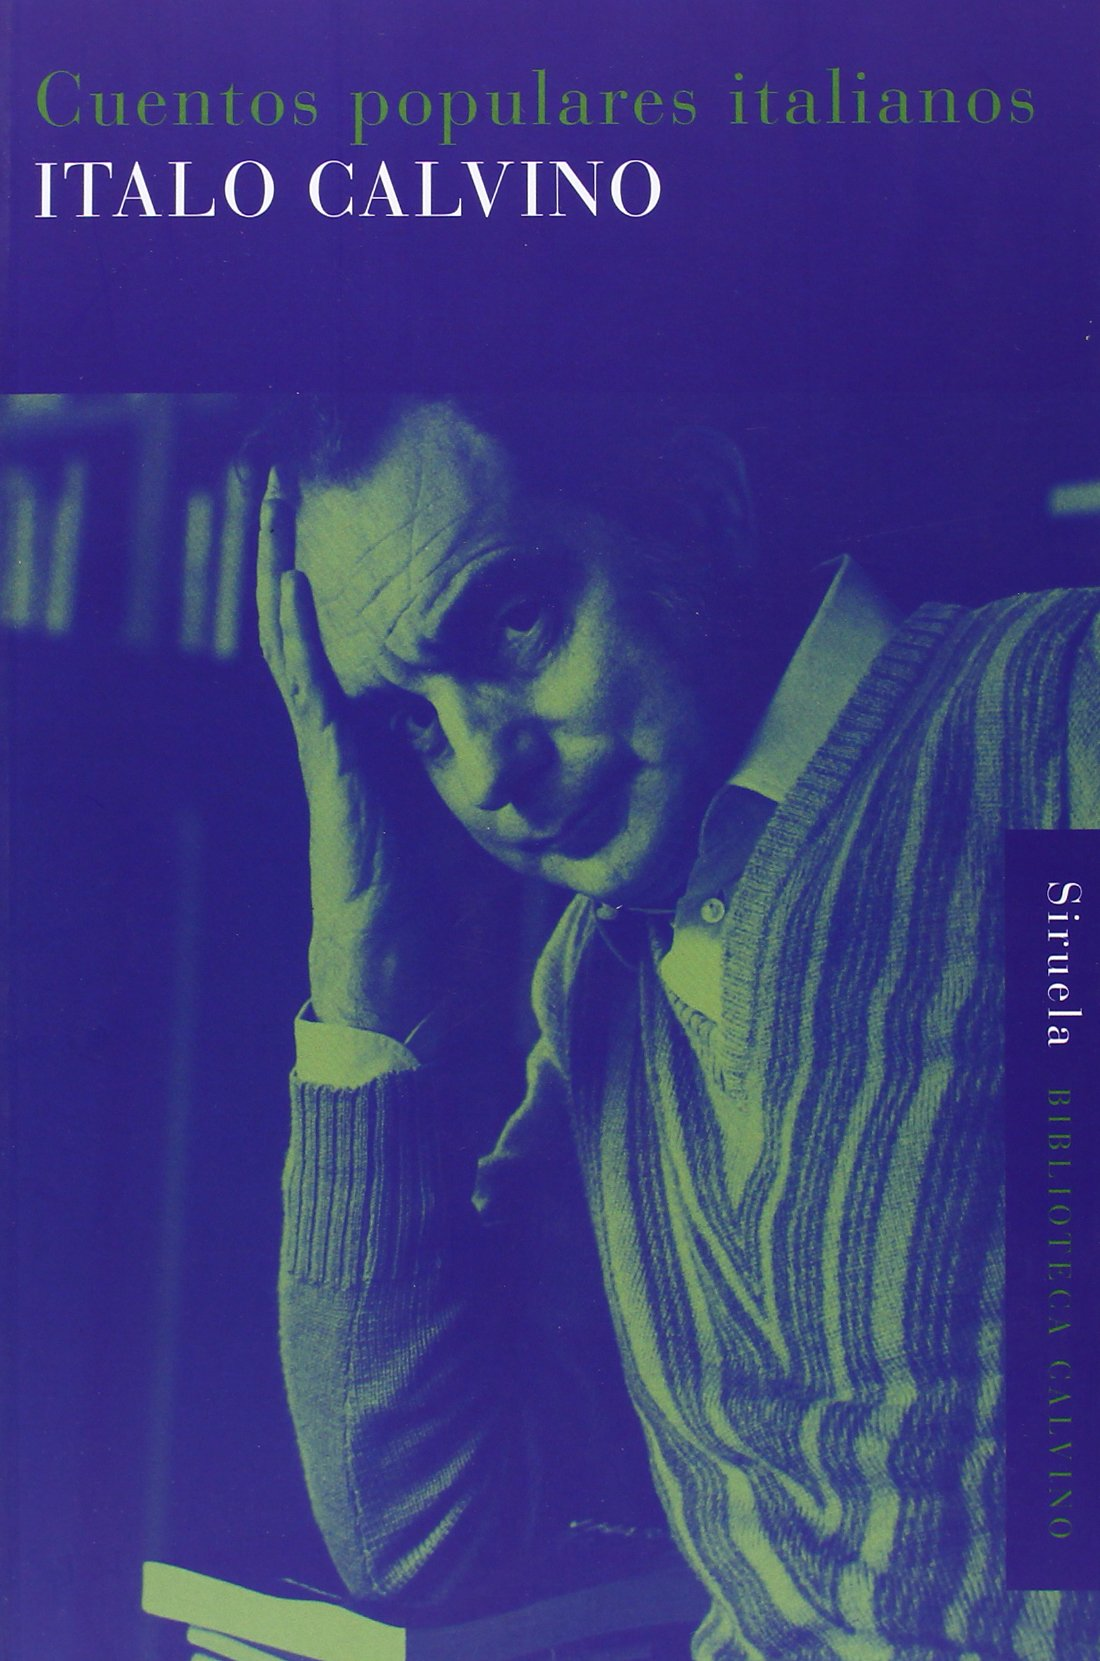 Cuentos populares italianos Italo Calvino